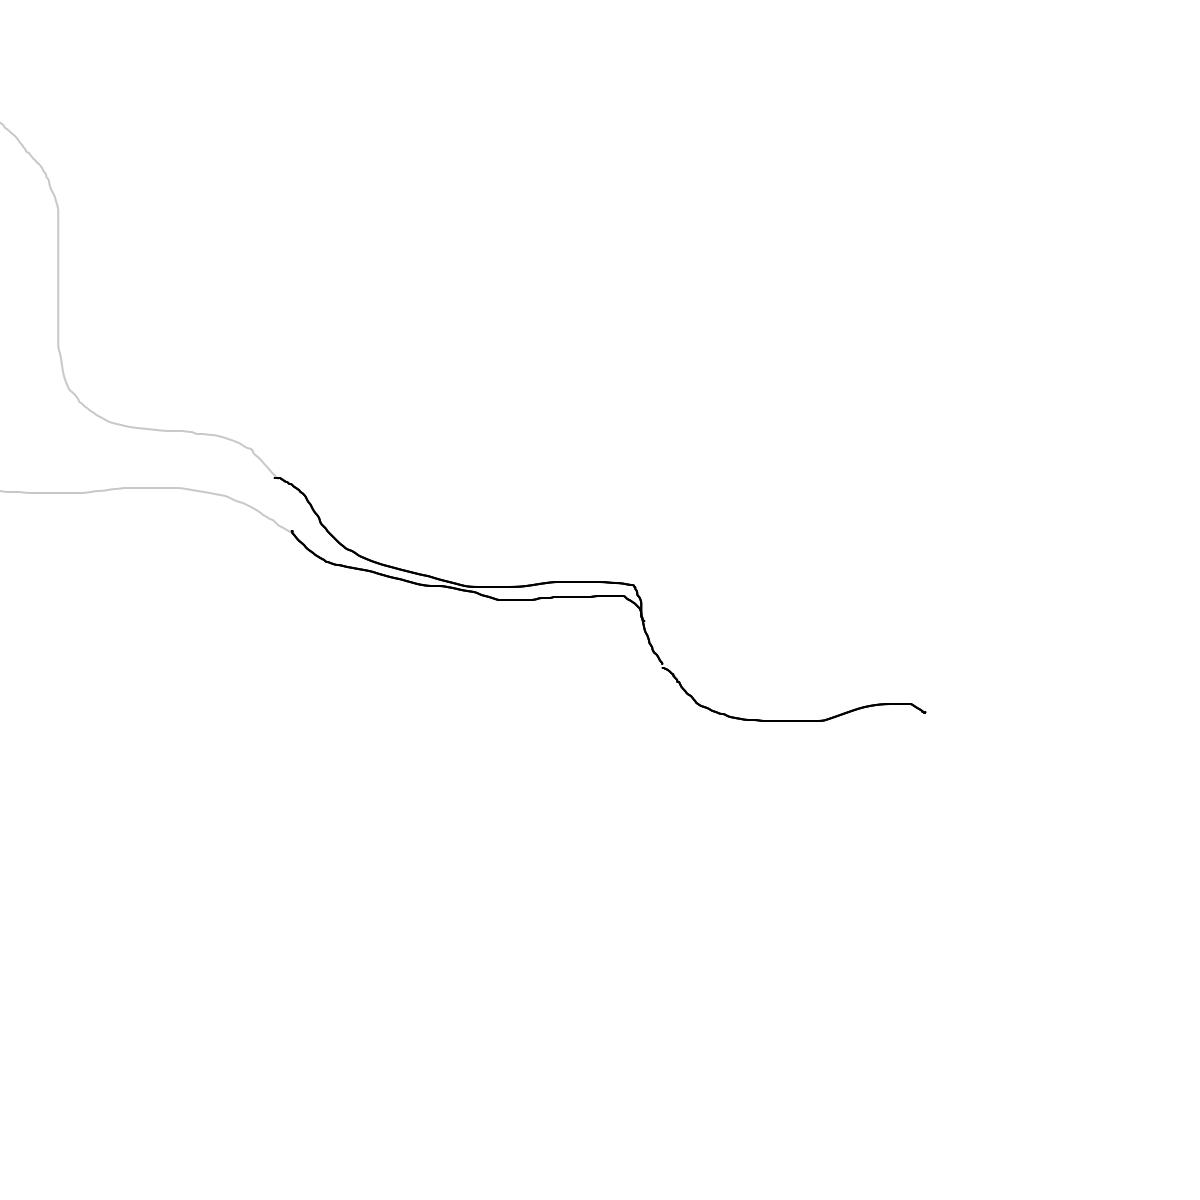 BAAAM drawing#6689 lat:35.6001052856445300lng: 139.4081726074218800